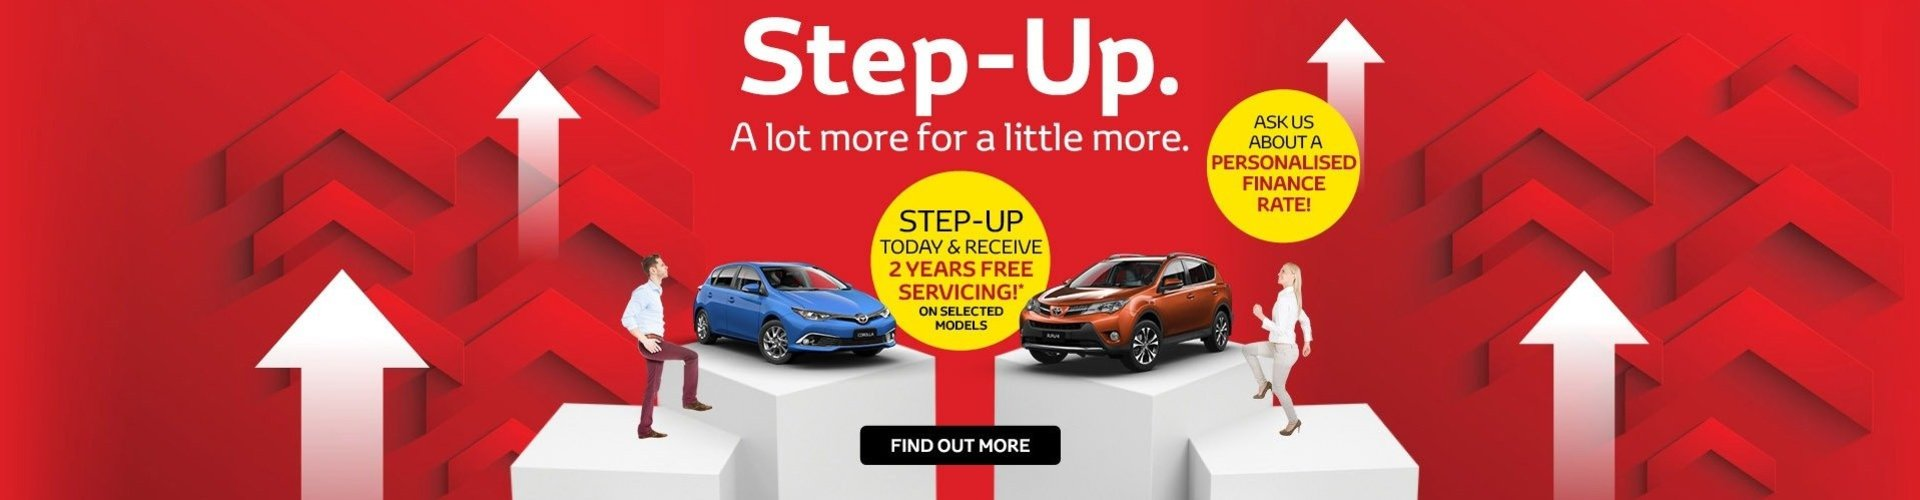 Step-Up Sale